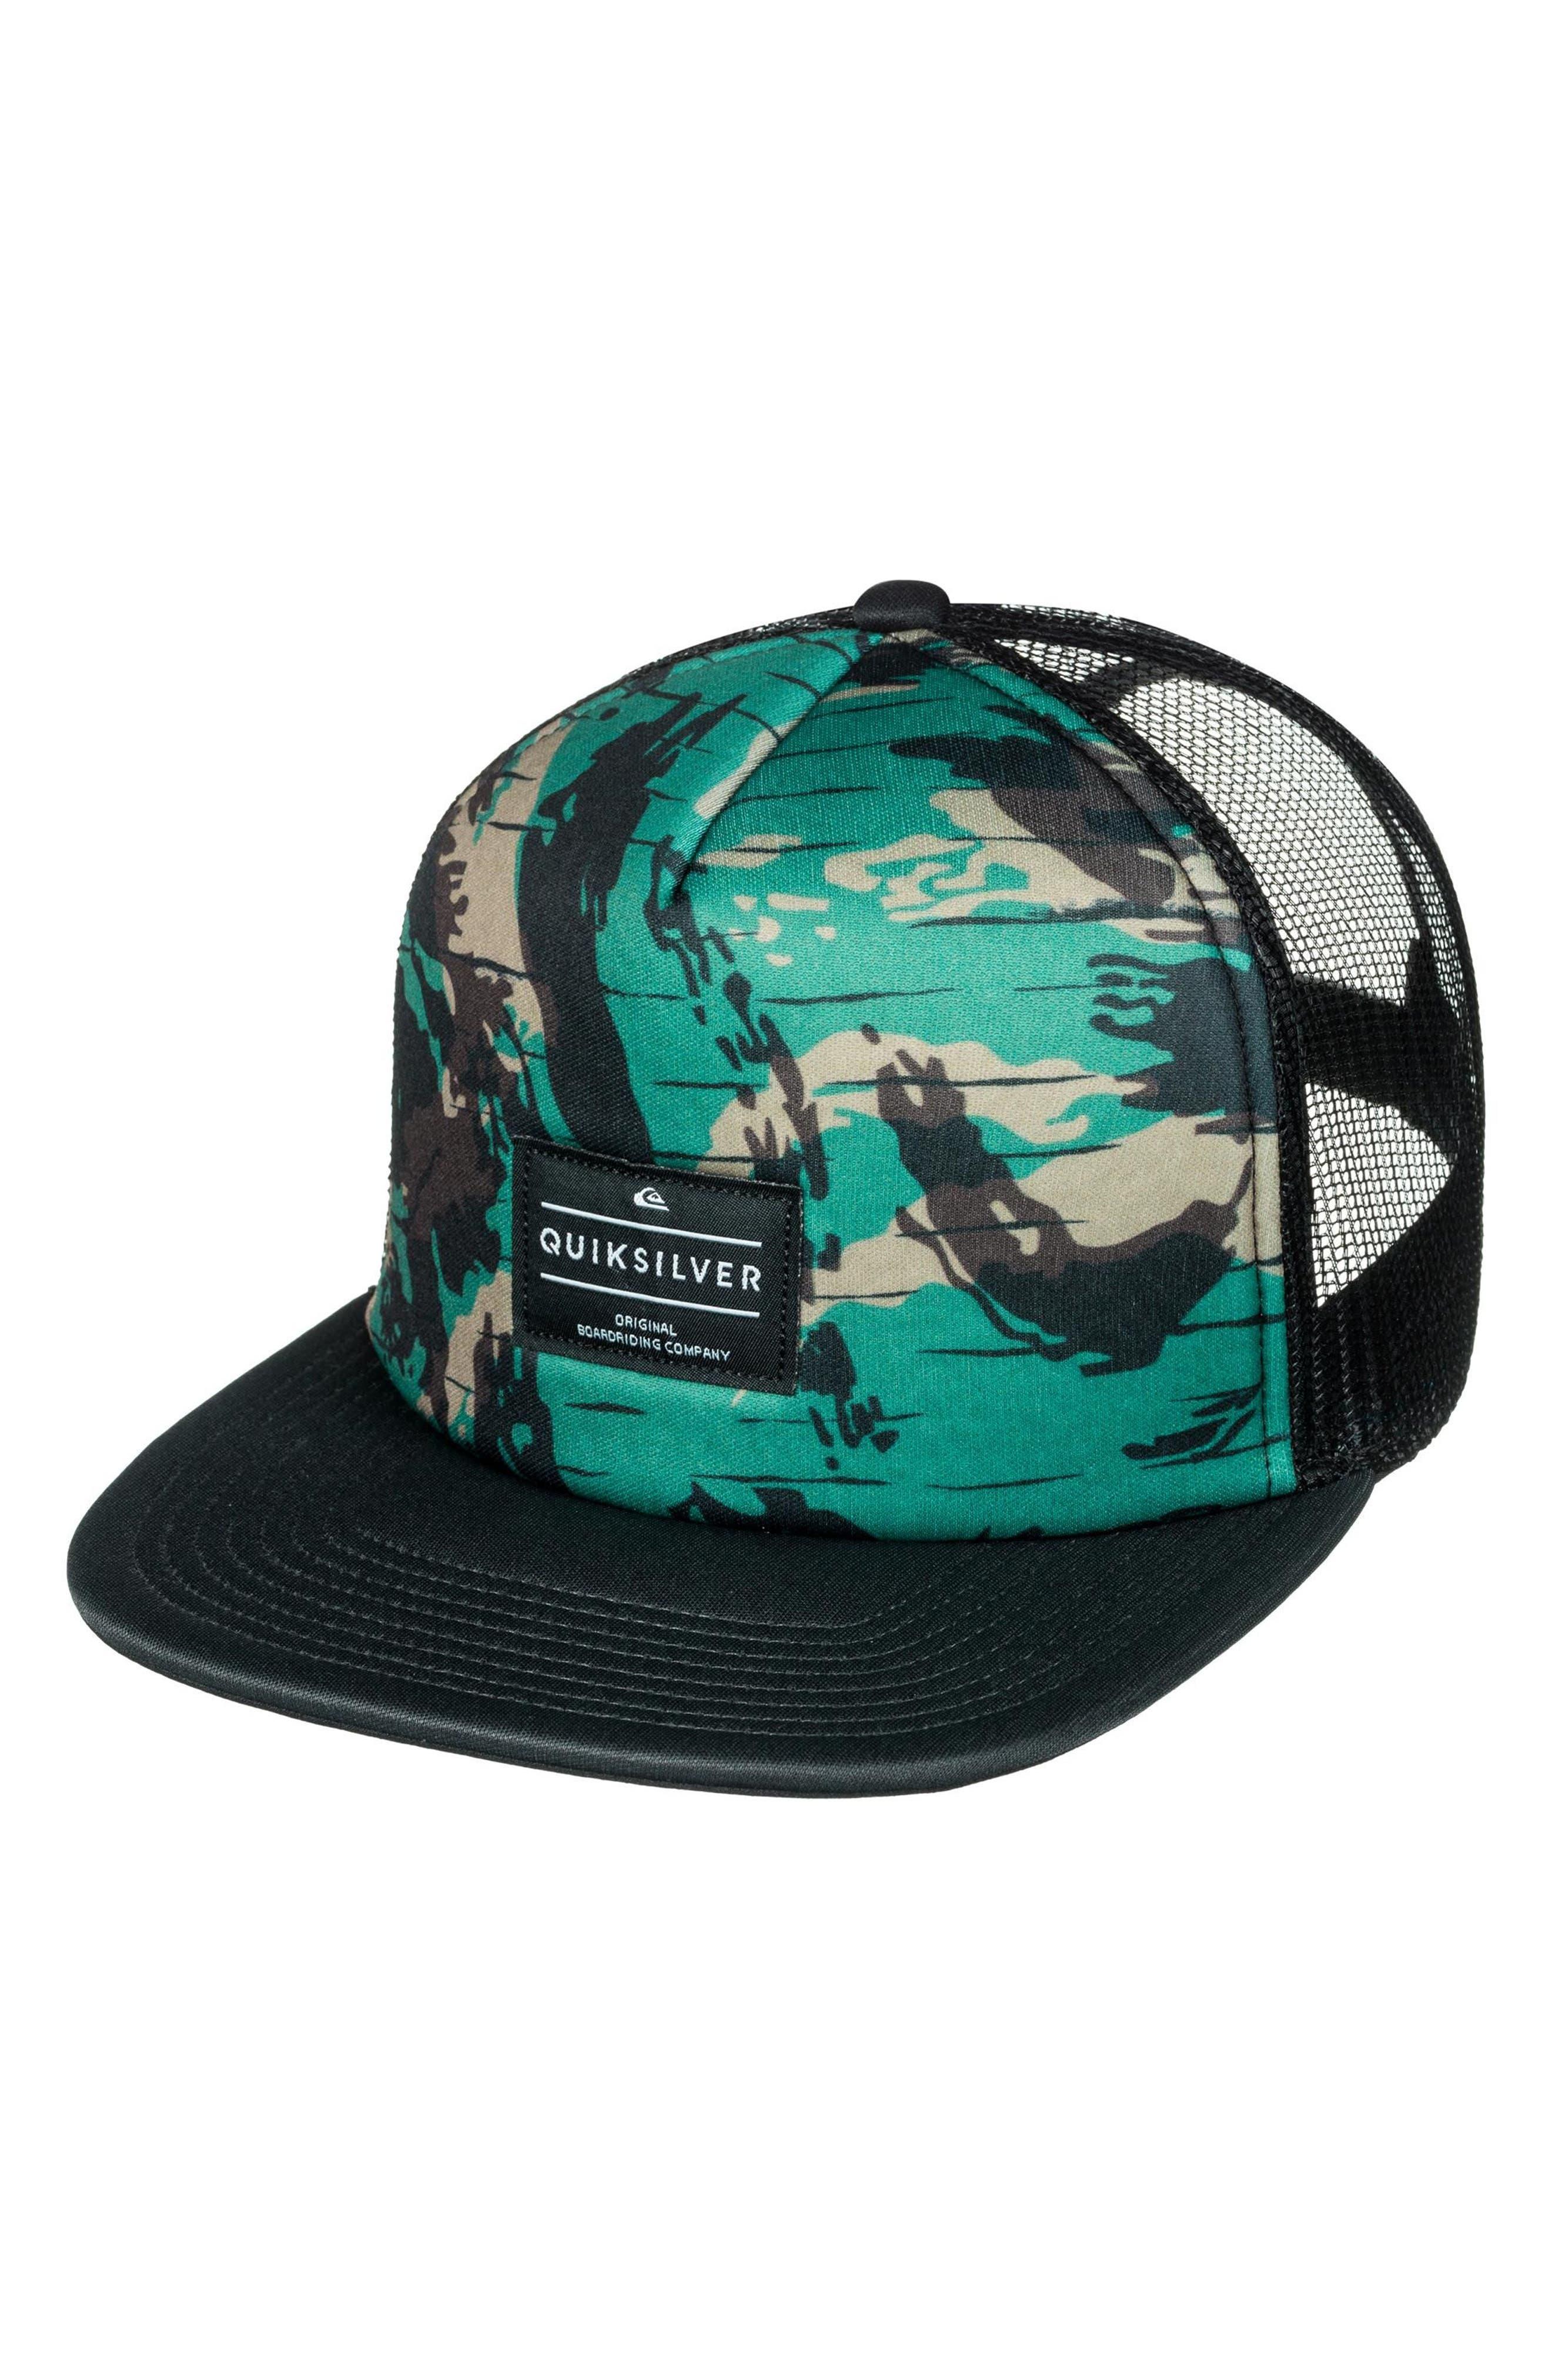 Brissells Trucker Hat,                             Main thumbnail 1, color,